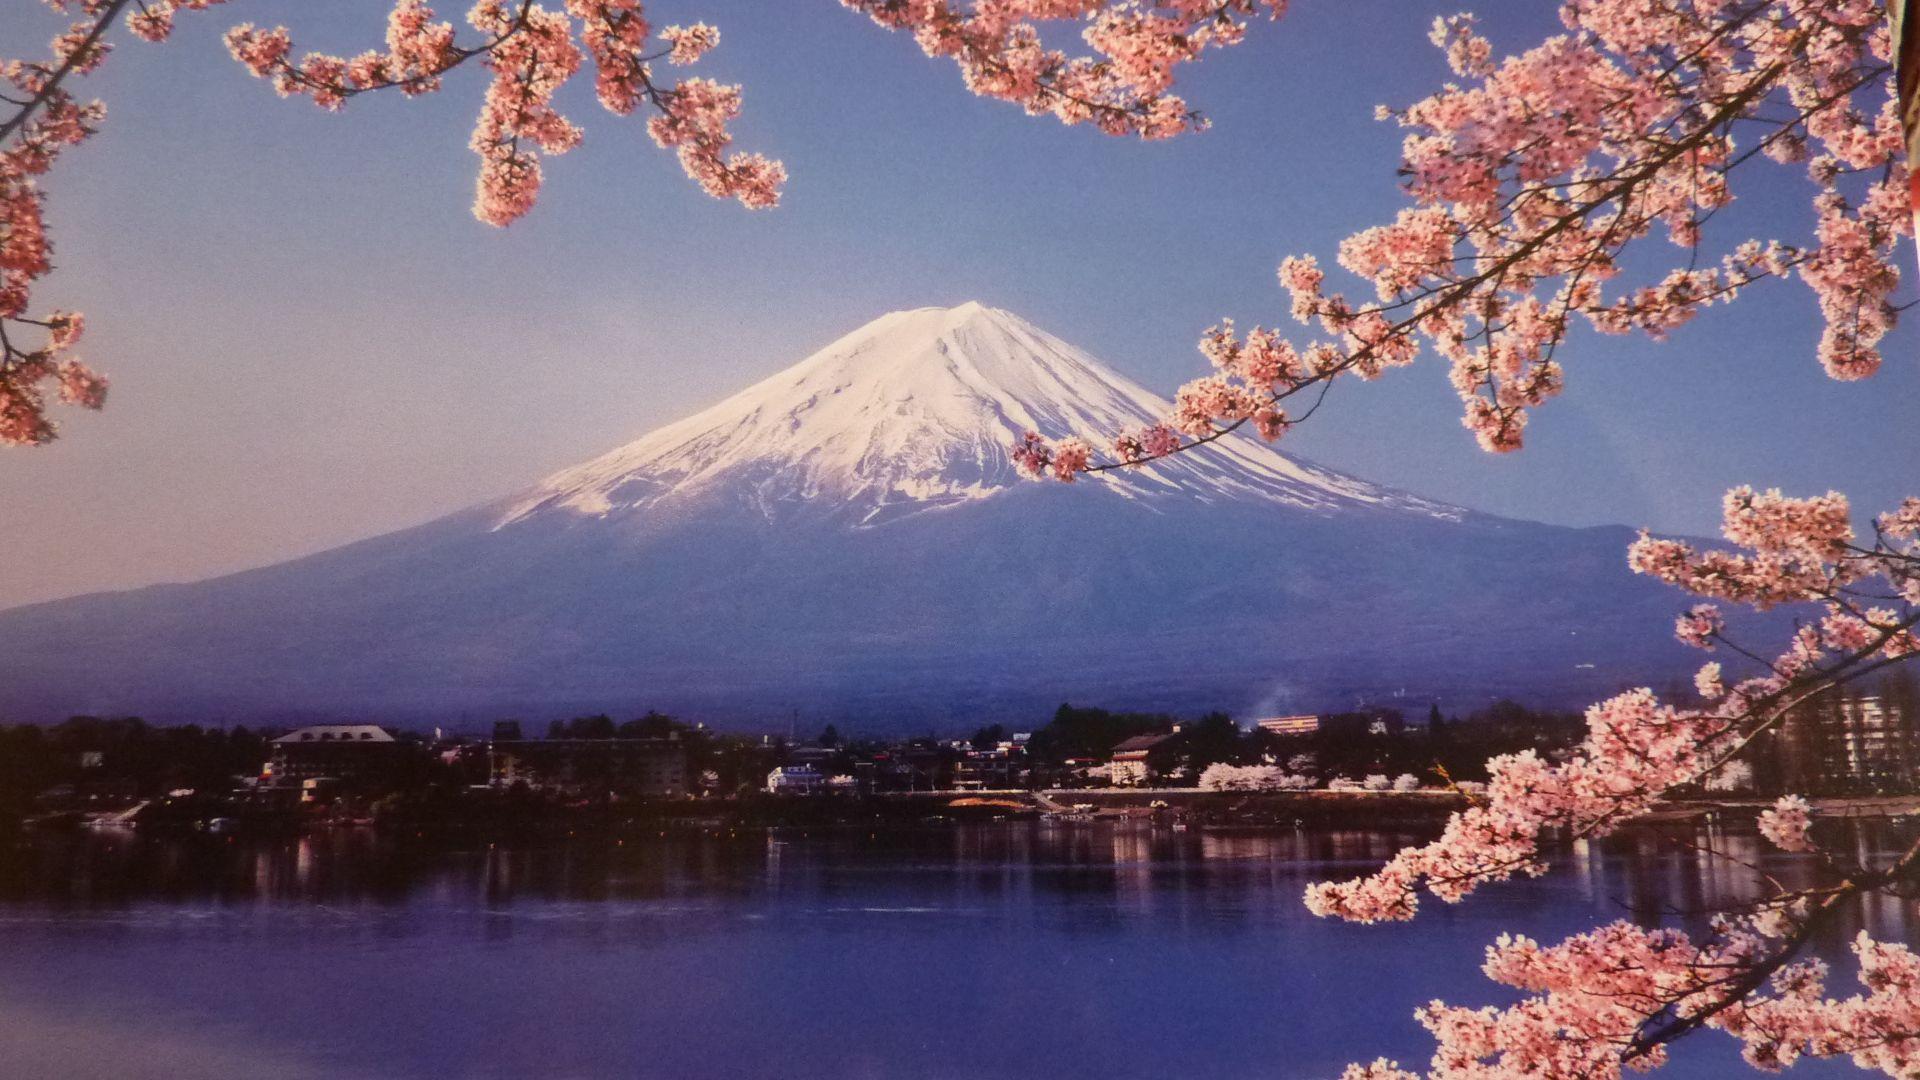 Spring Flower Garden Mount Fuji Lake Kawaguchi Wallpapers